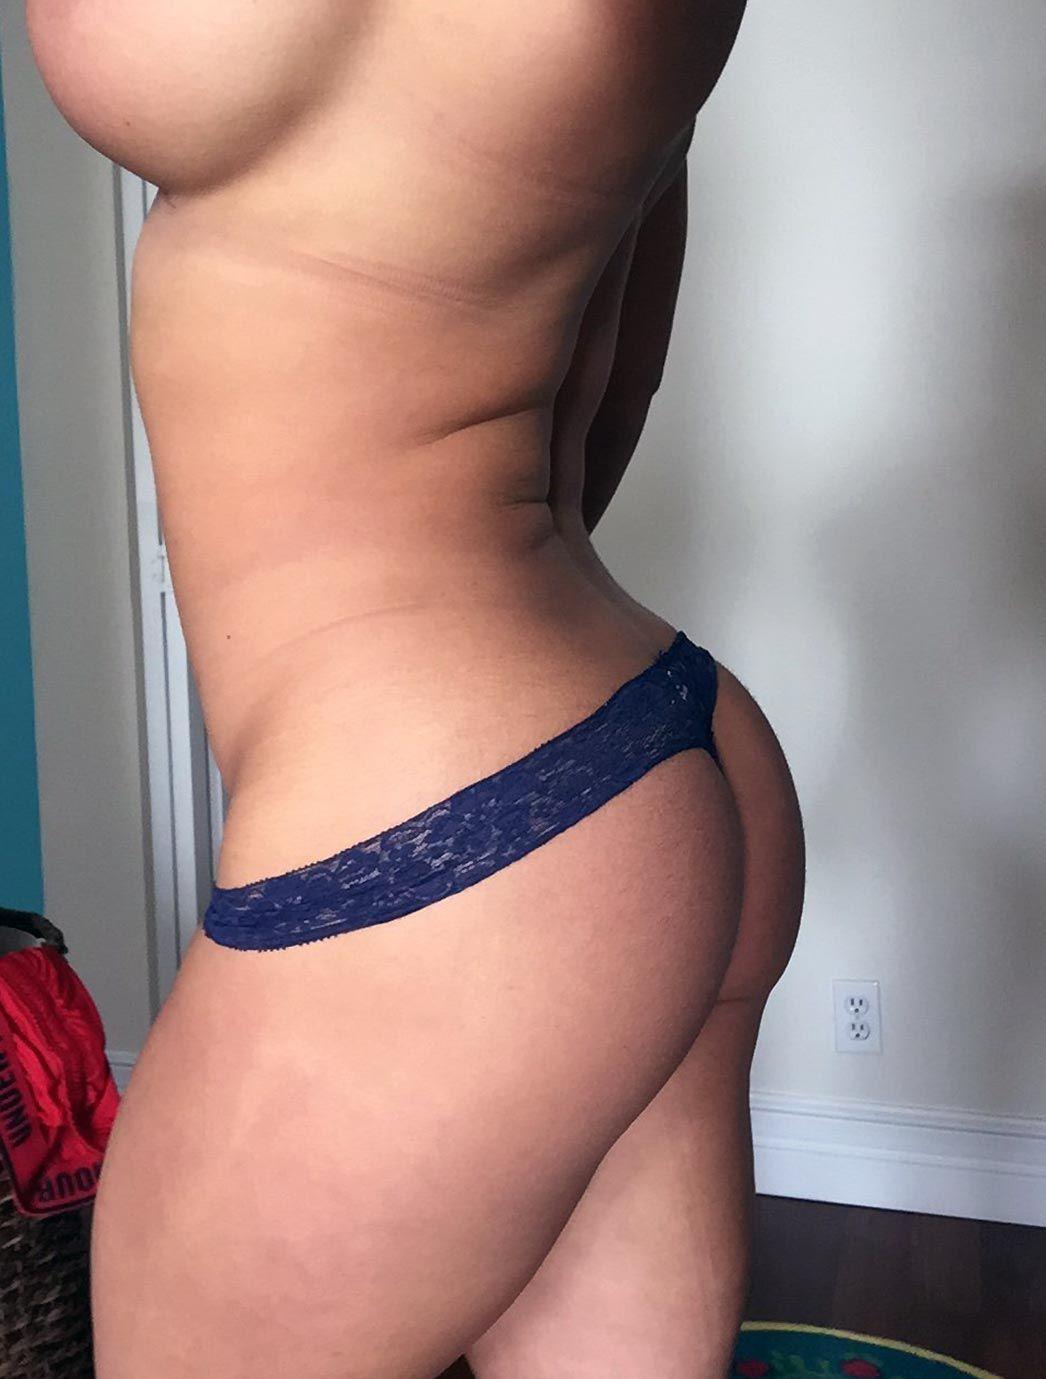 Celeste Bonin Nude Leaked The Fappening & Sexy 0206